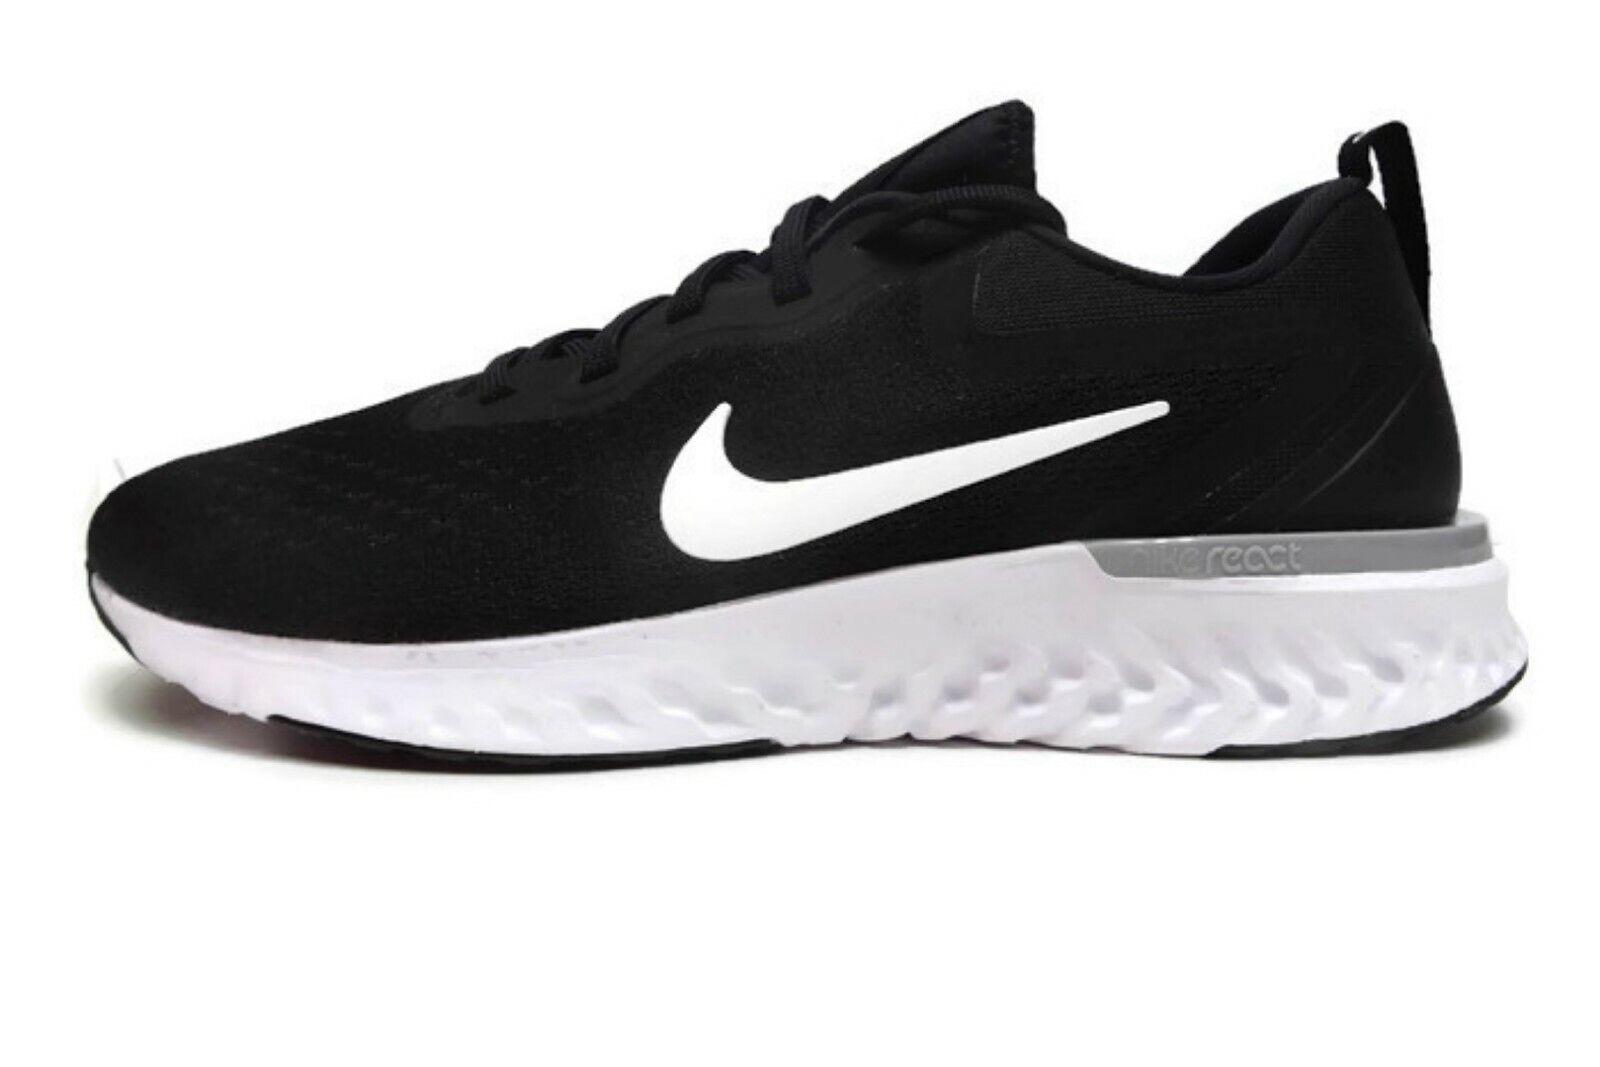 Nike Womens Odyssey React Running shoes Black White Wolf Grey 9